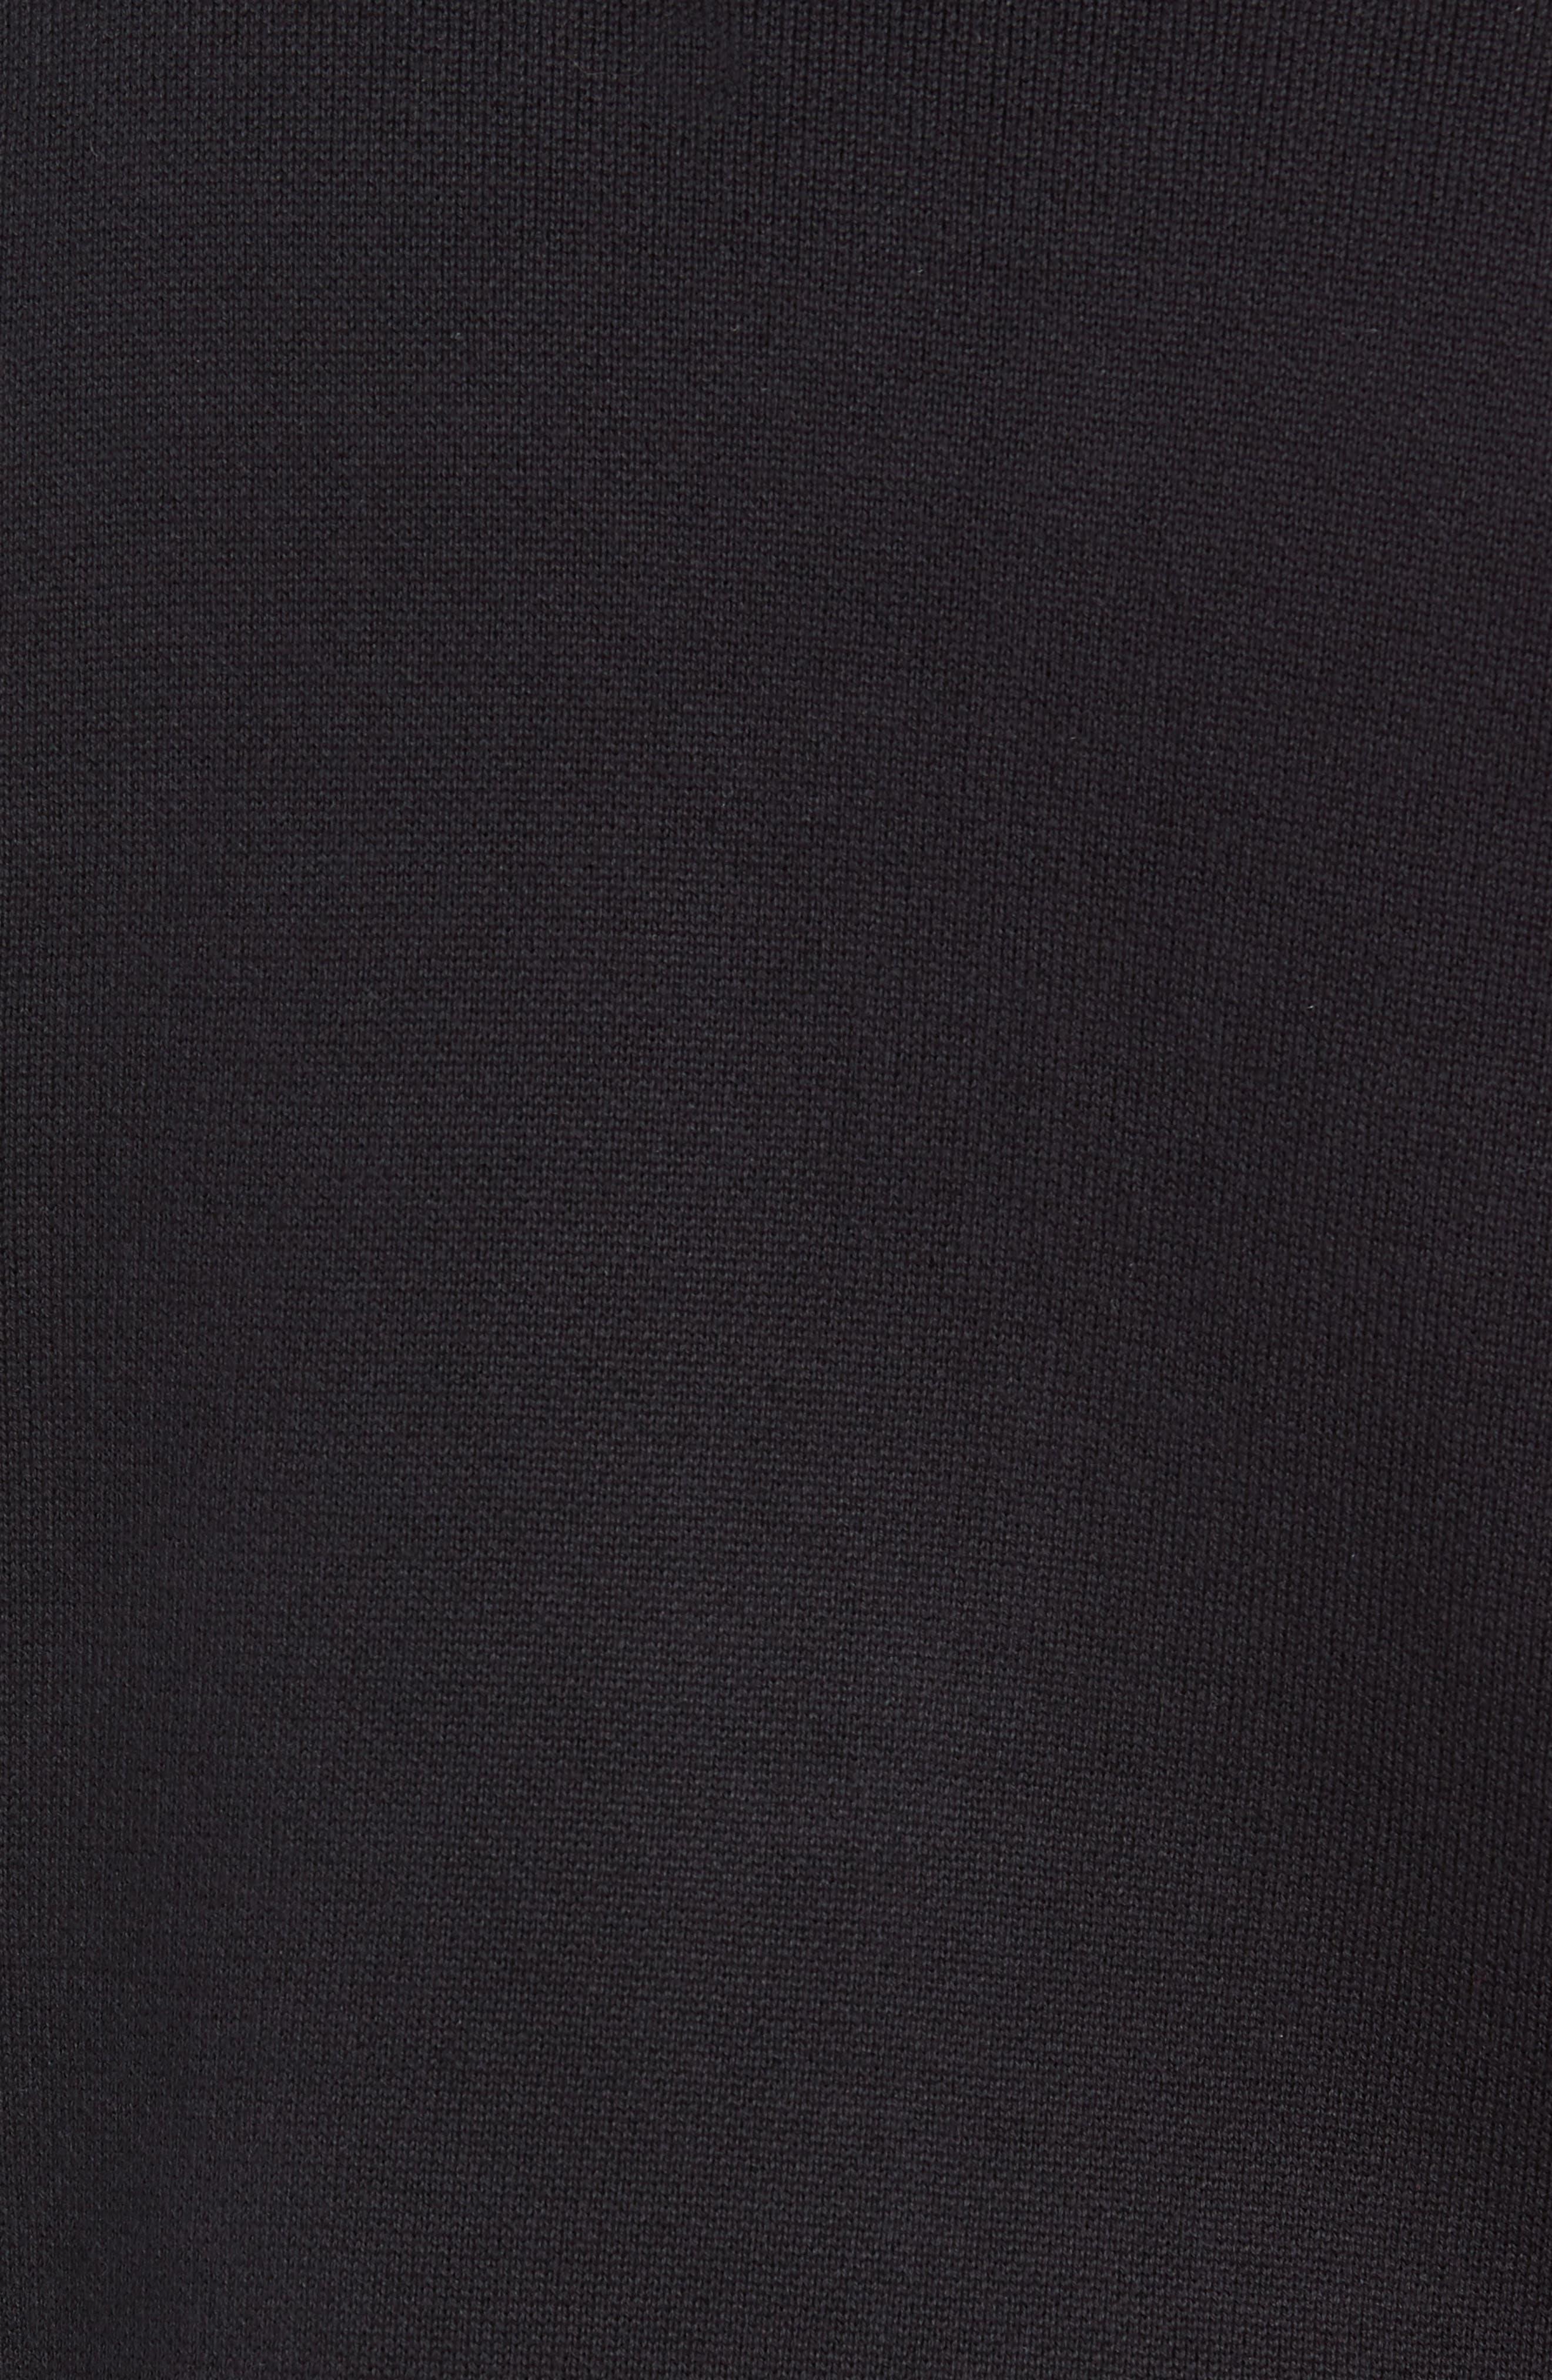 Check Yo Sleeve Crewneck Sweater,                             Alternate thumbnail 5, color,                             001